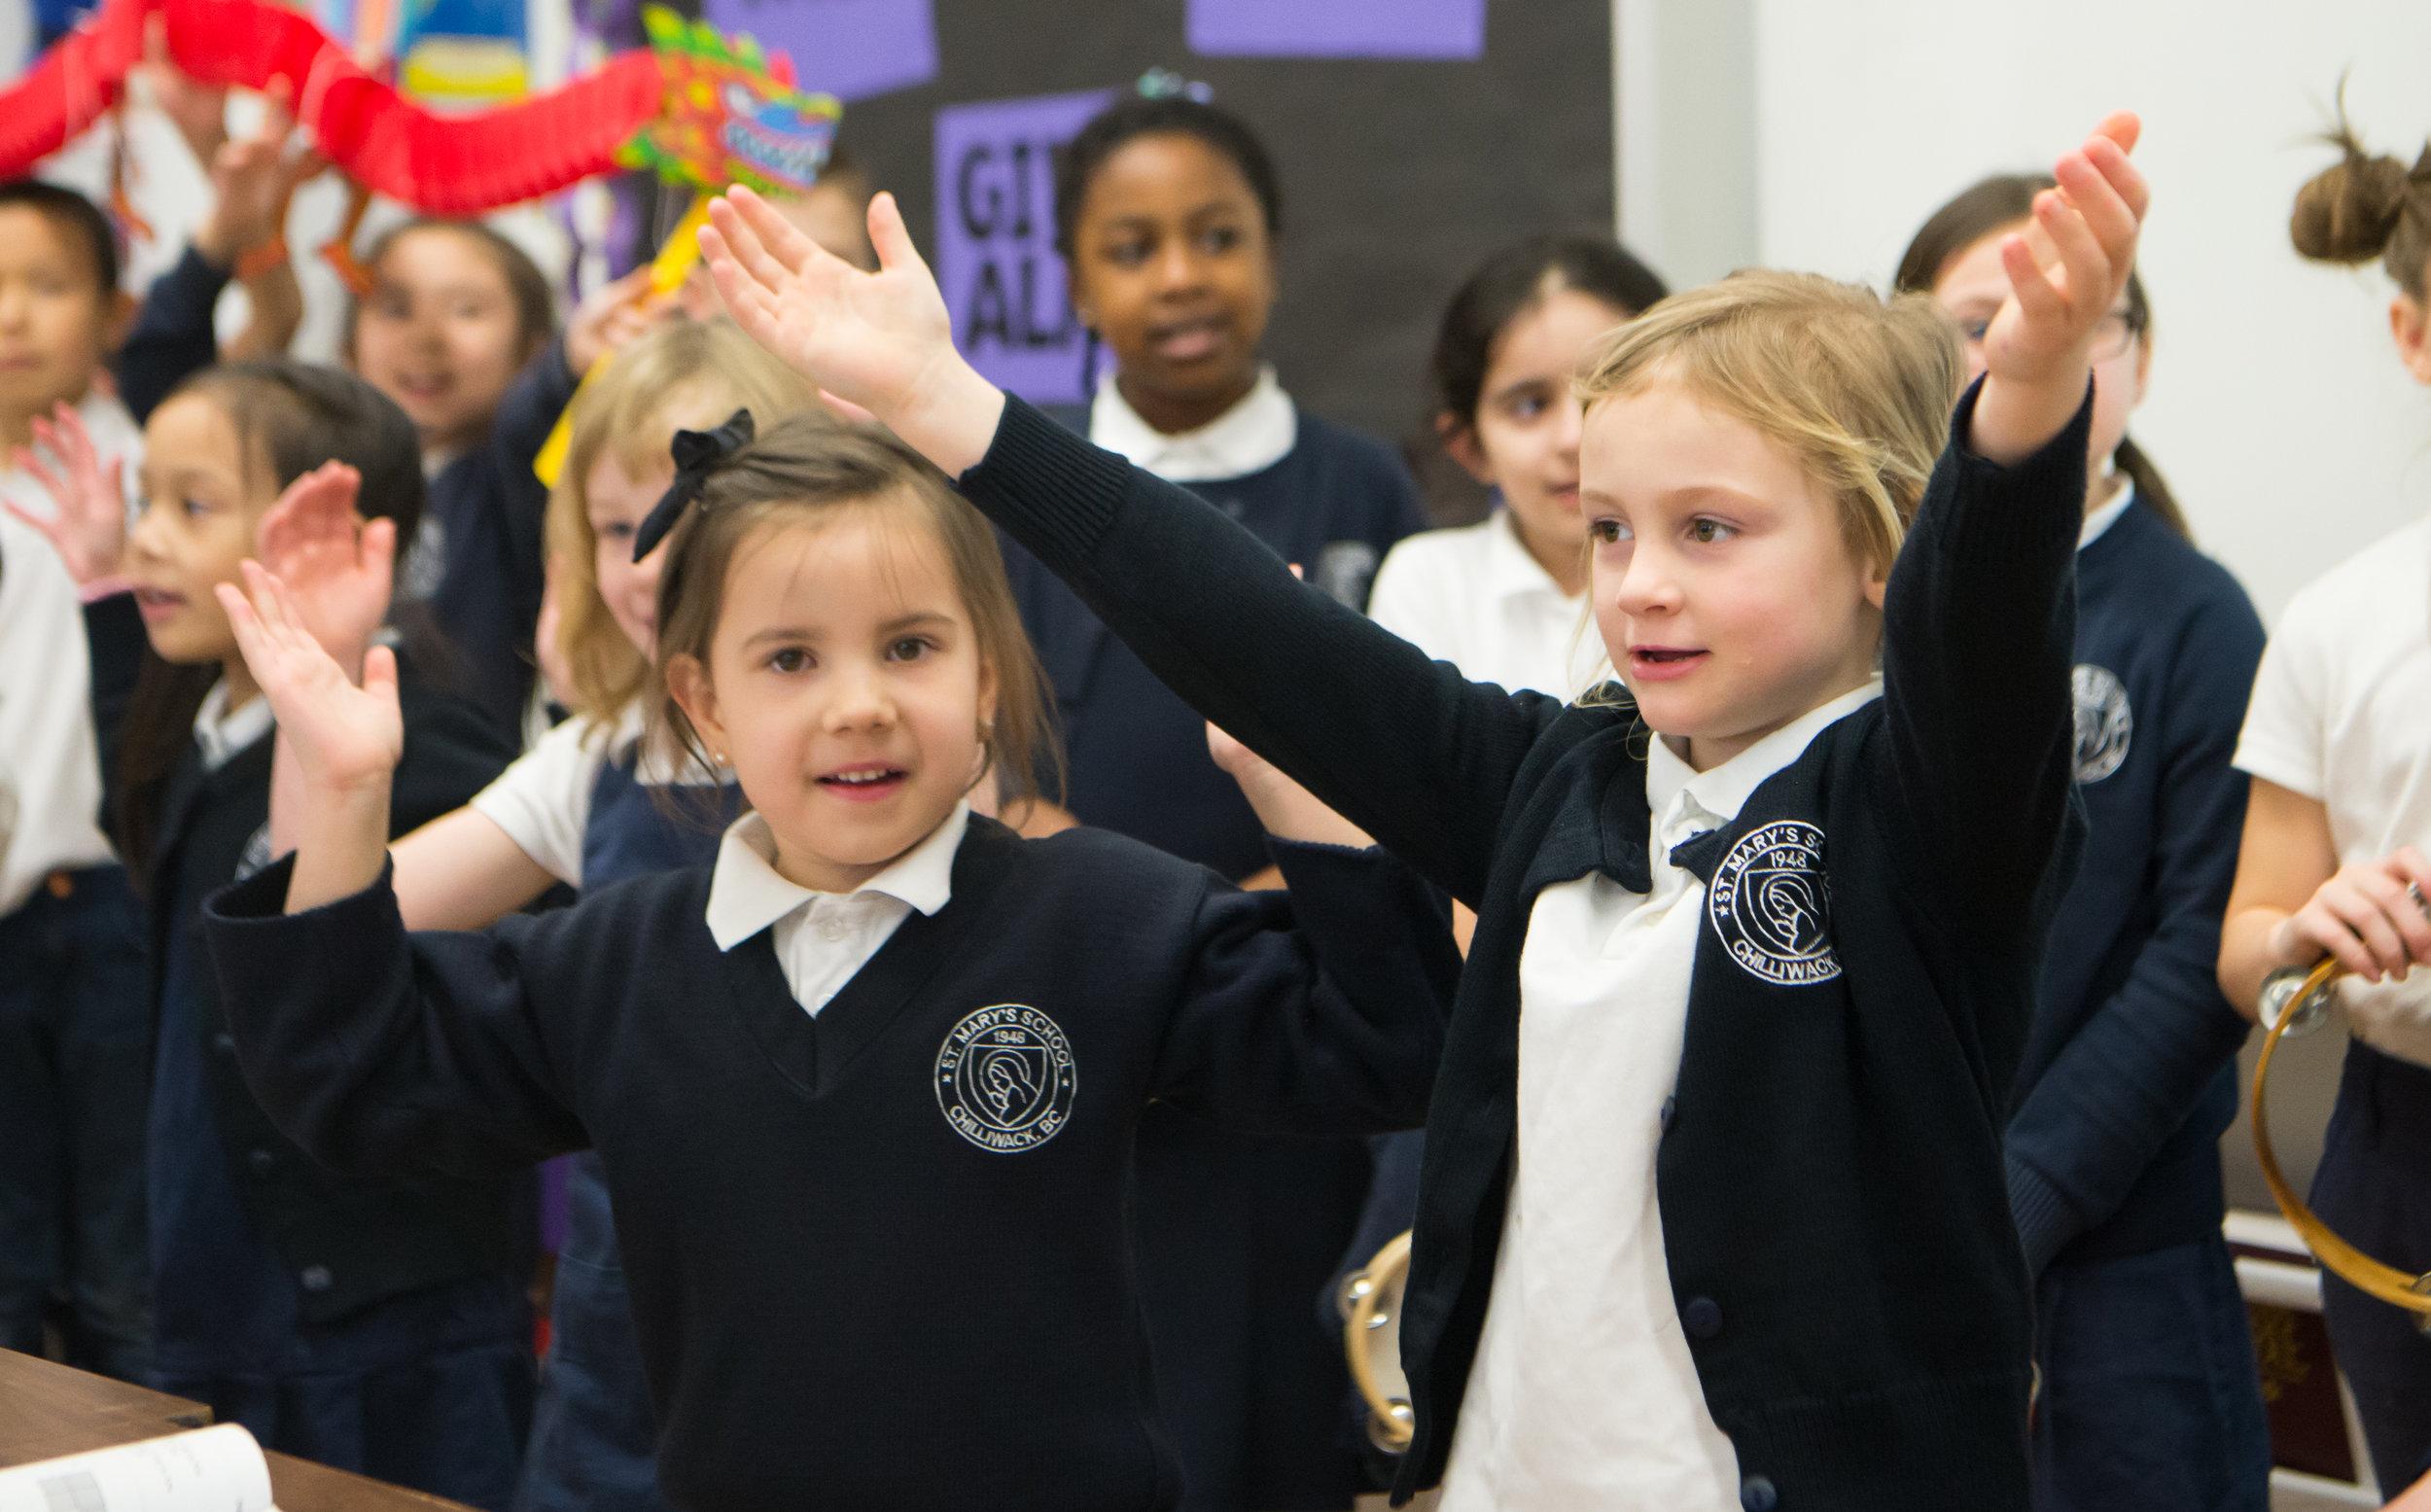 Children wearing the Saint Mary's School uniform.